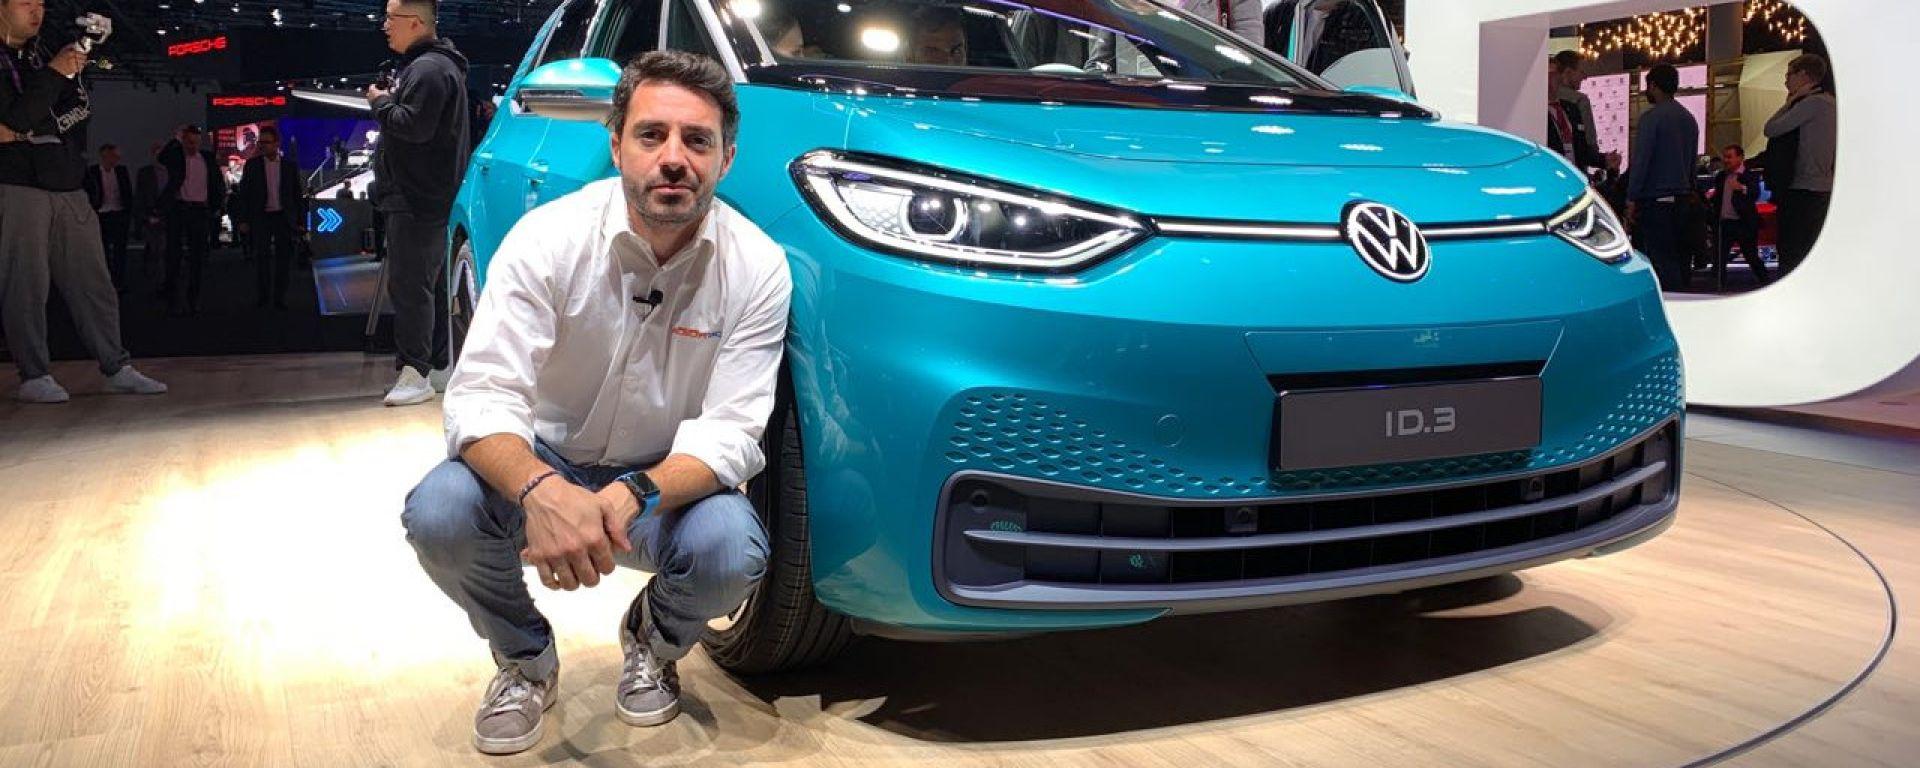 Nuova Volkswagen ID.3 a Francoforte 2019